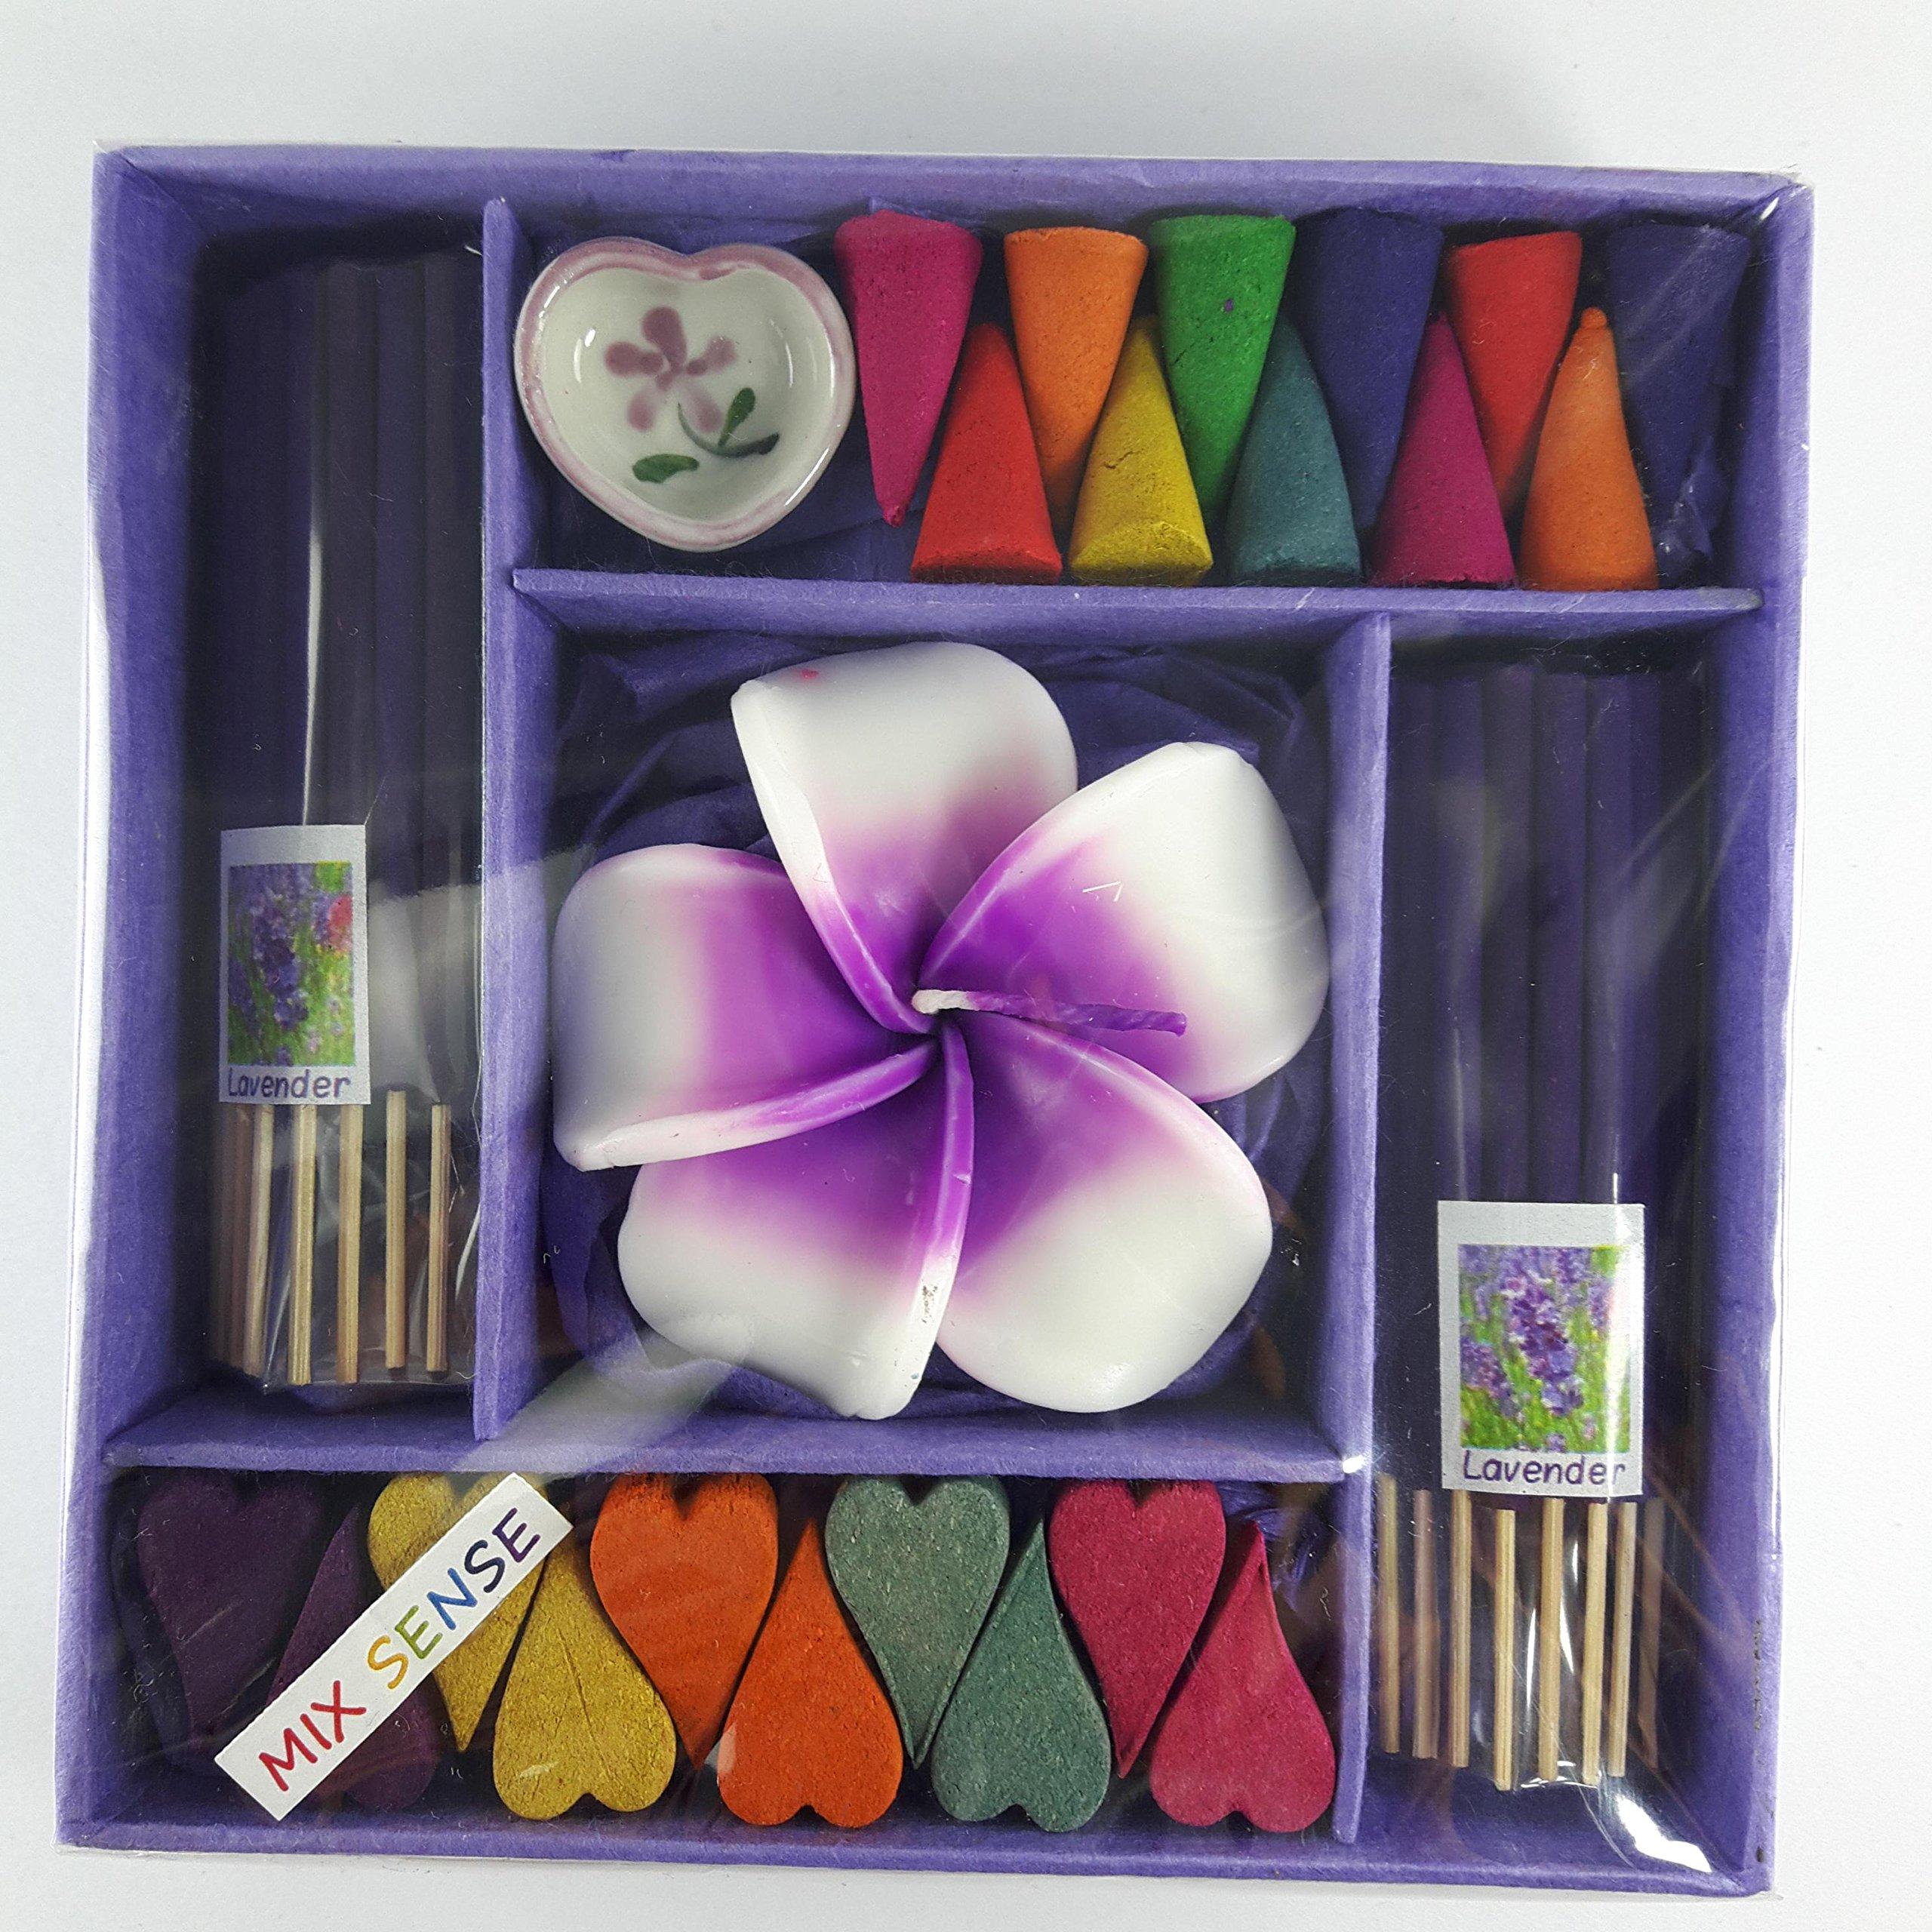 kornkorn87 Incense Spa Aroma Fragrance Cones Burner Holder Thai Scent Relax Sticks Ceramic Home Gift